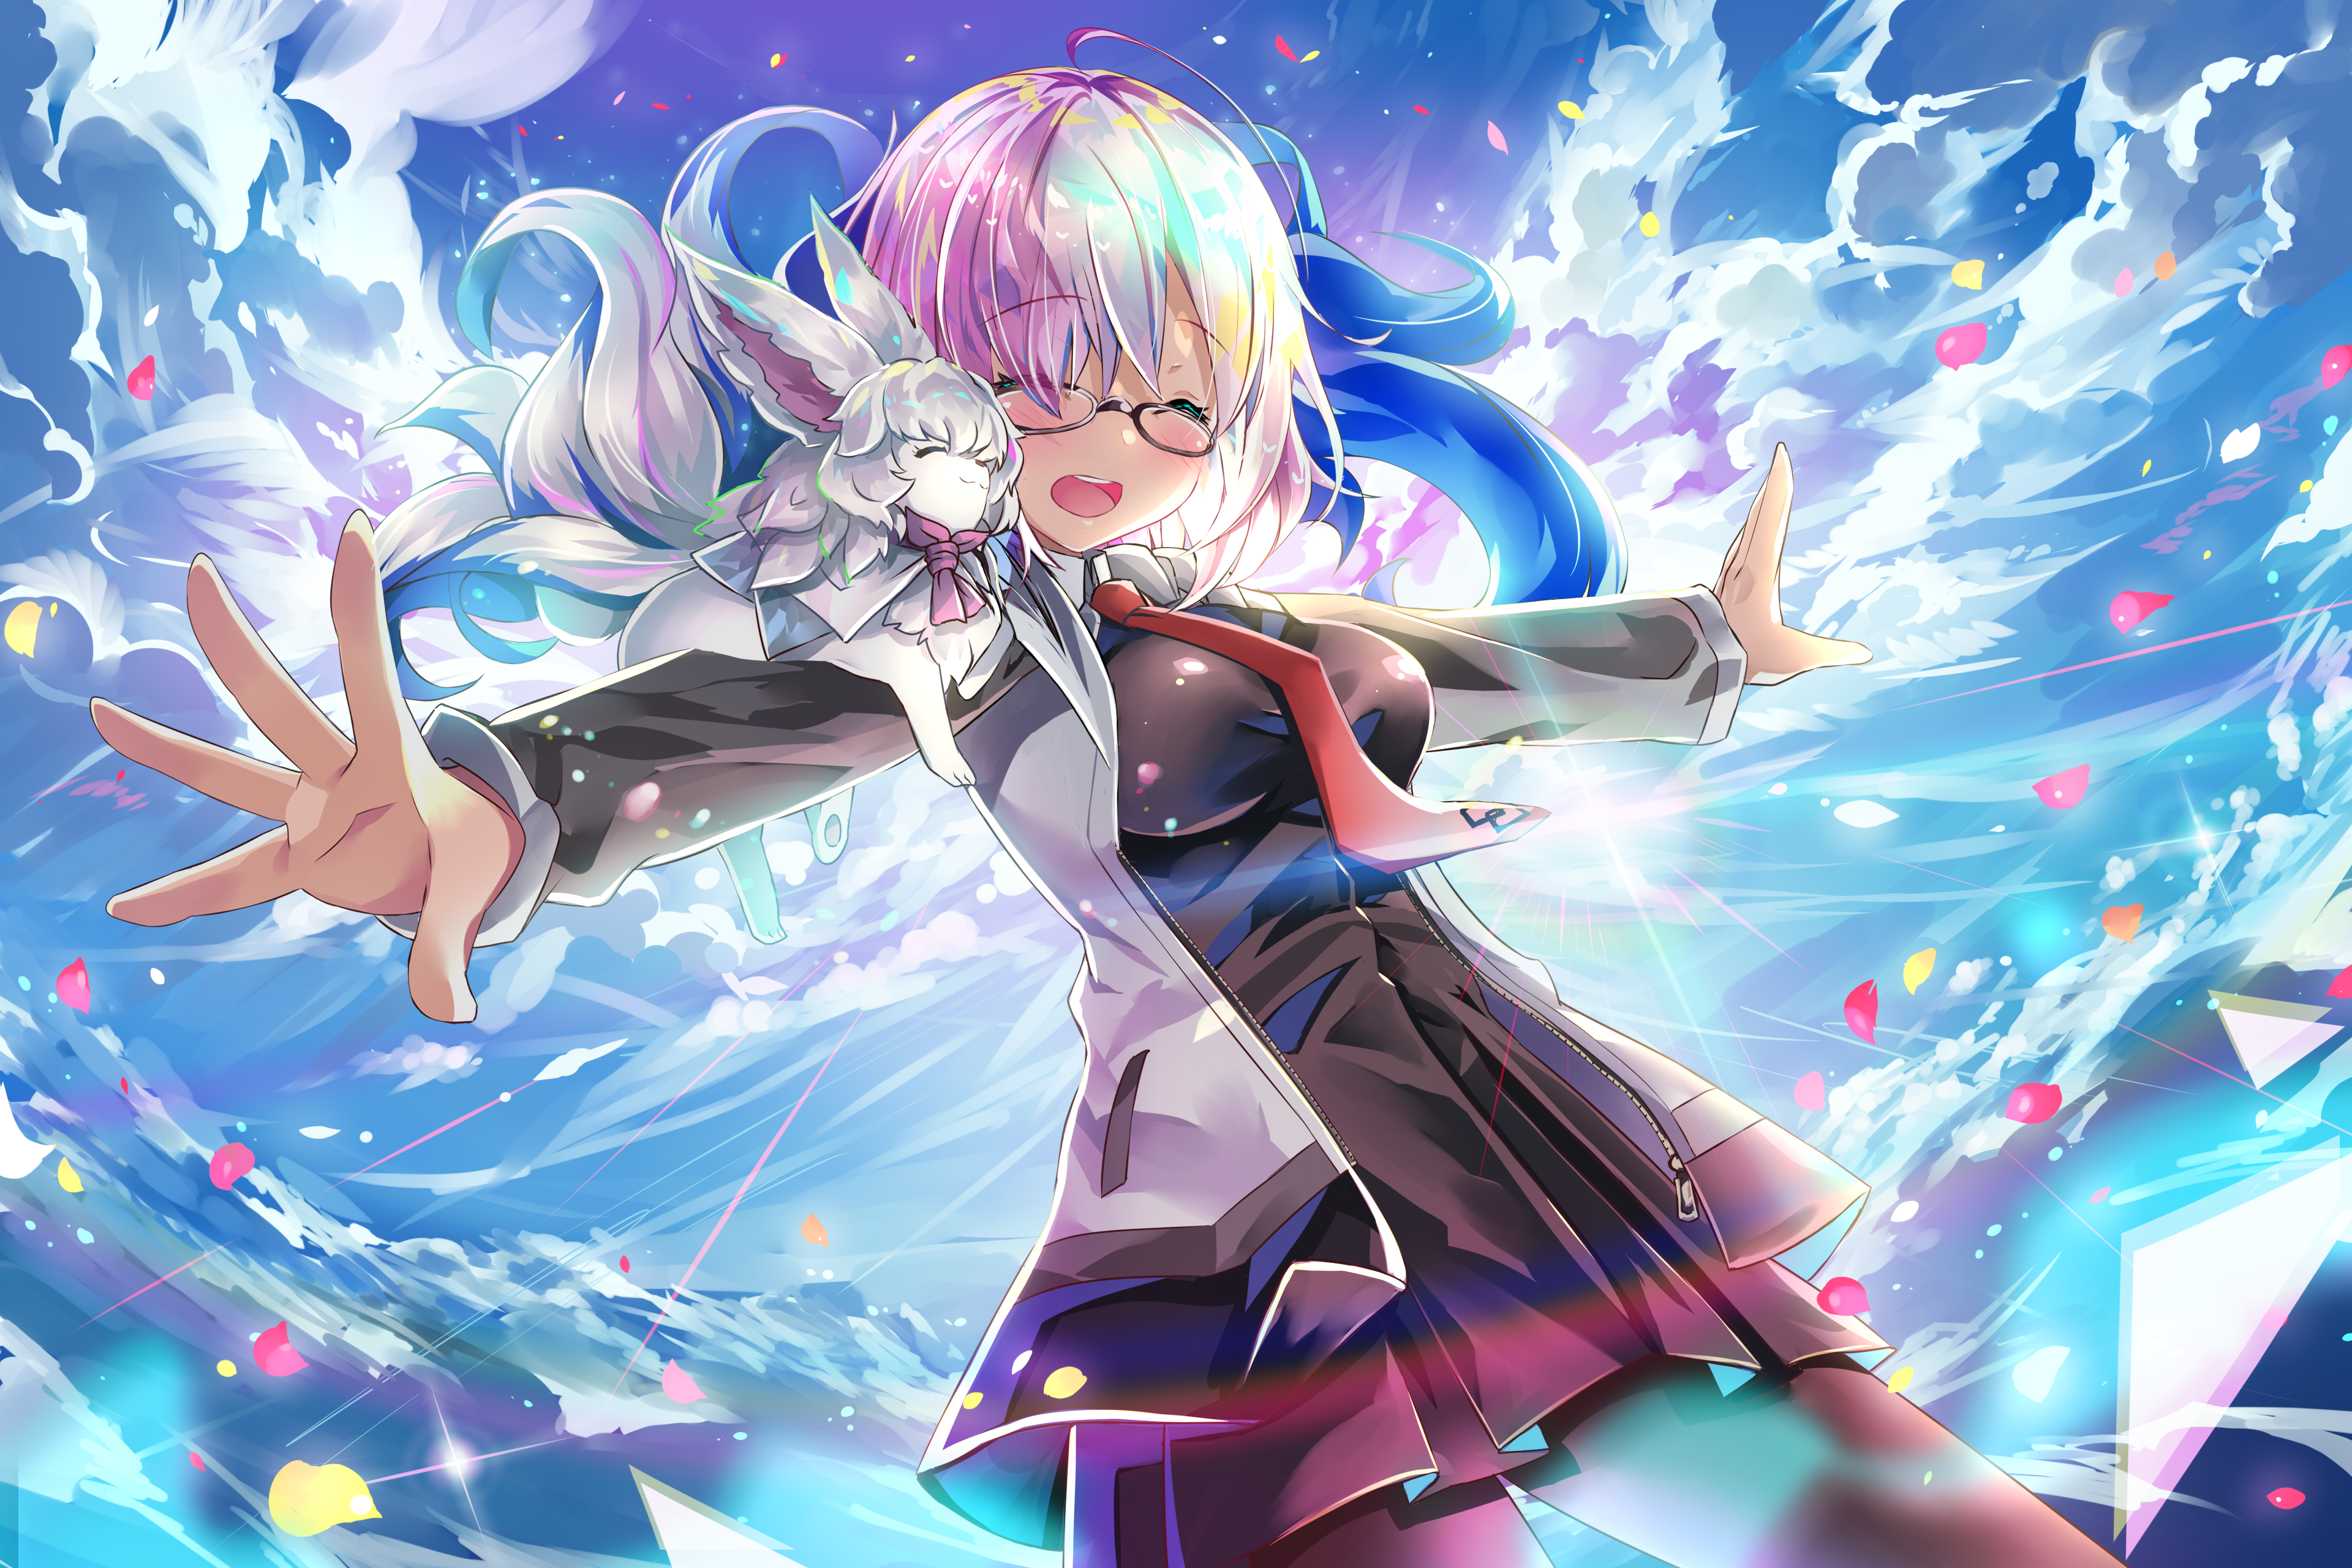 Fate Grand Order Mashu Kyrielight 4k Ultra Hd Wallpaper Background Image 3840x2560 Id 991225 Wallpaper Abyss